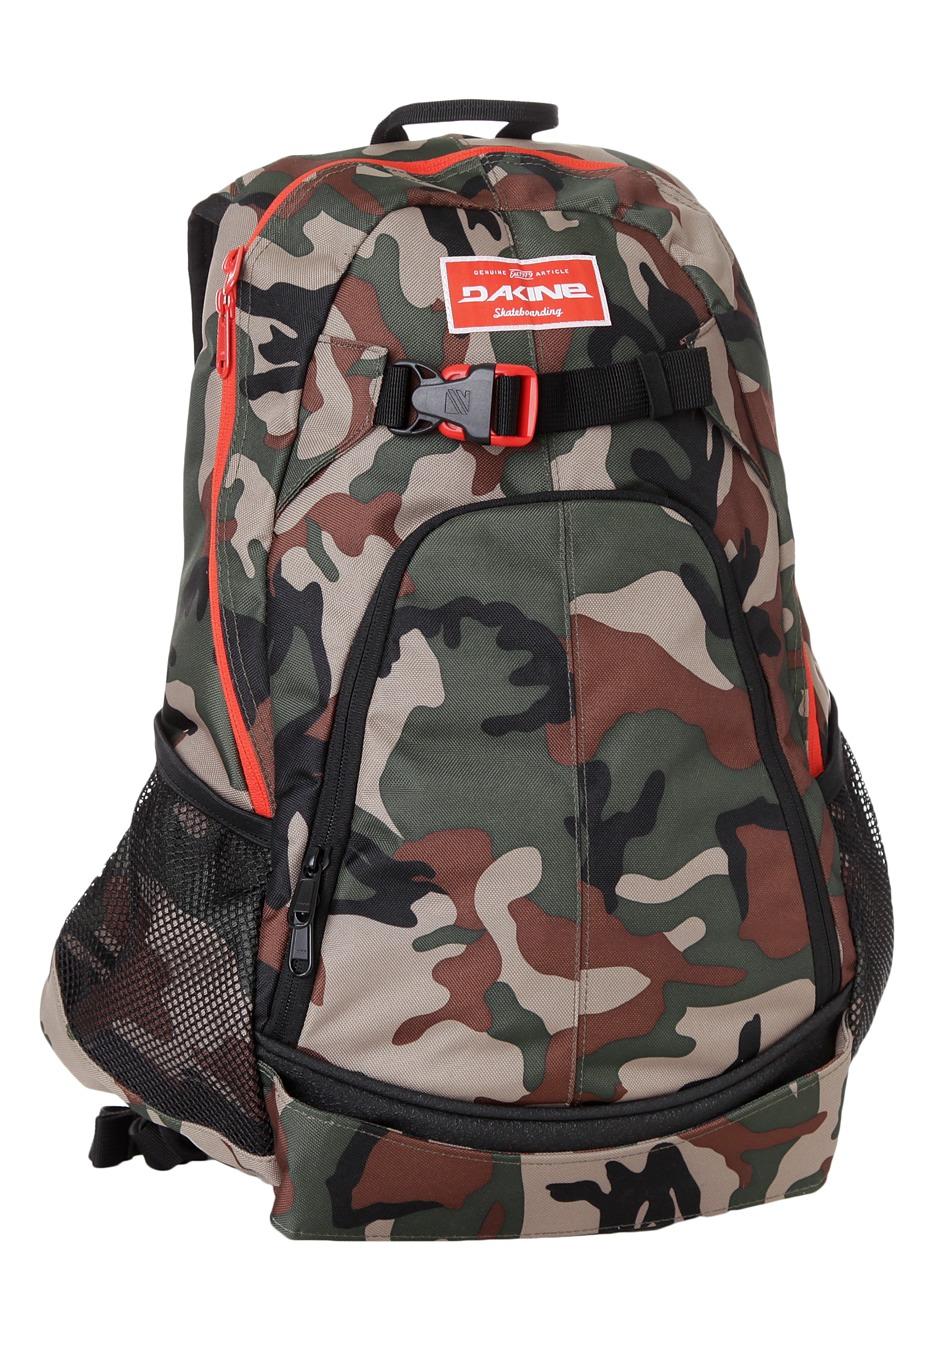 Dakine - Pivot Camo - Backpack - Impericon.com Worldwide